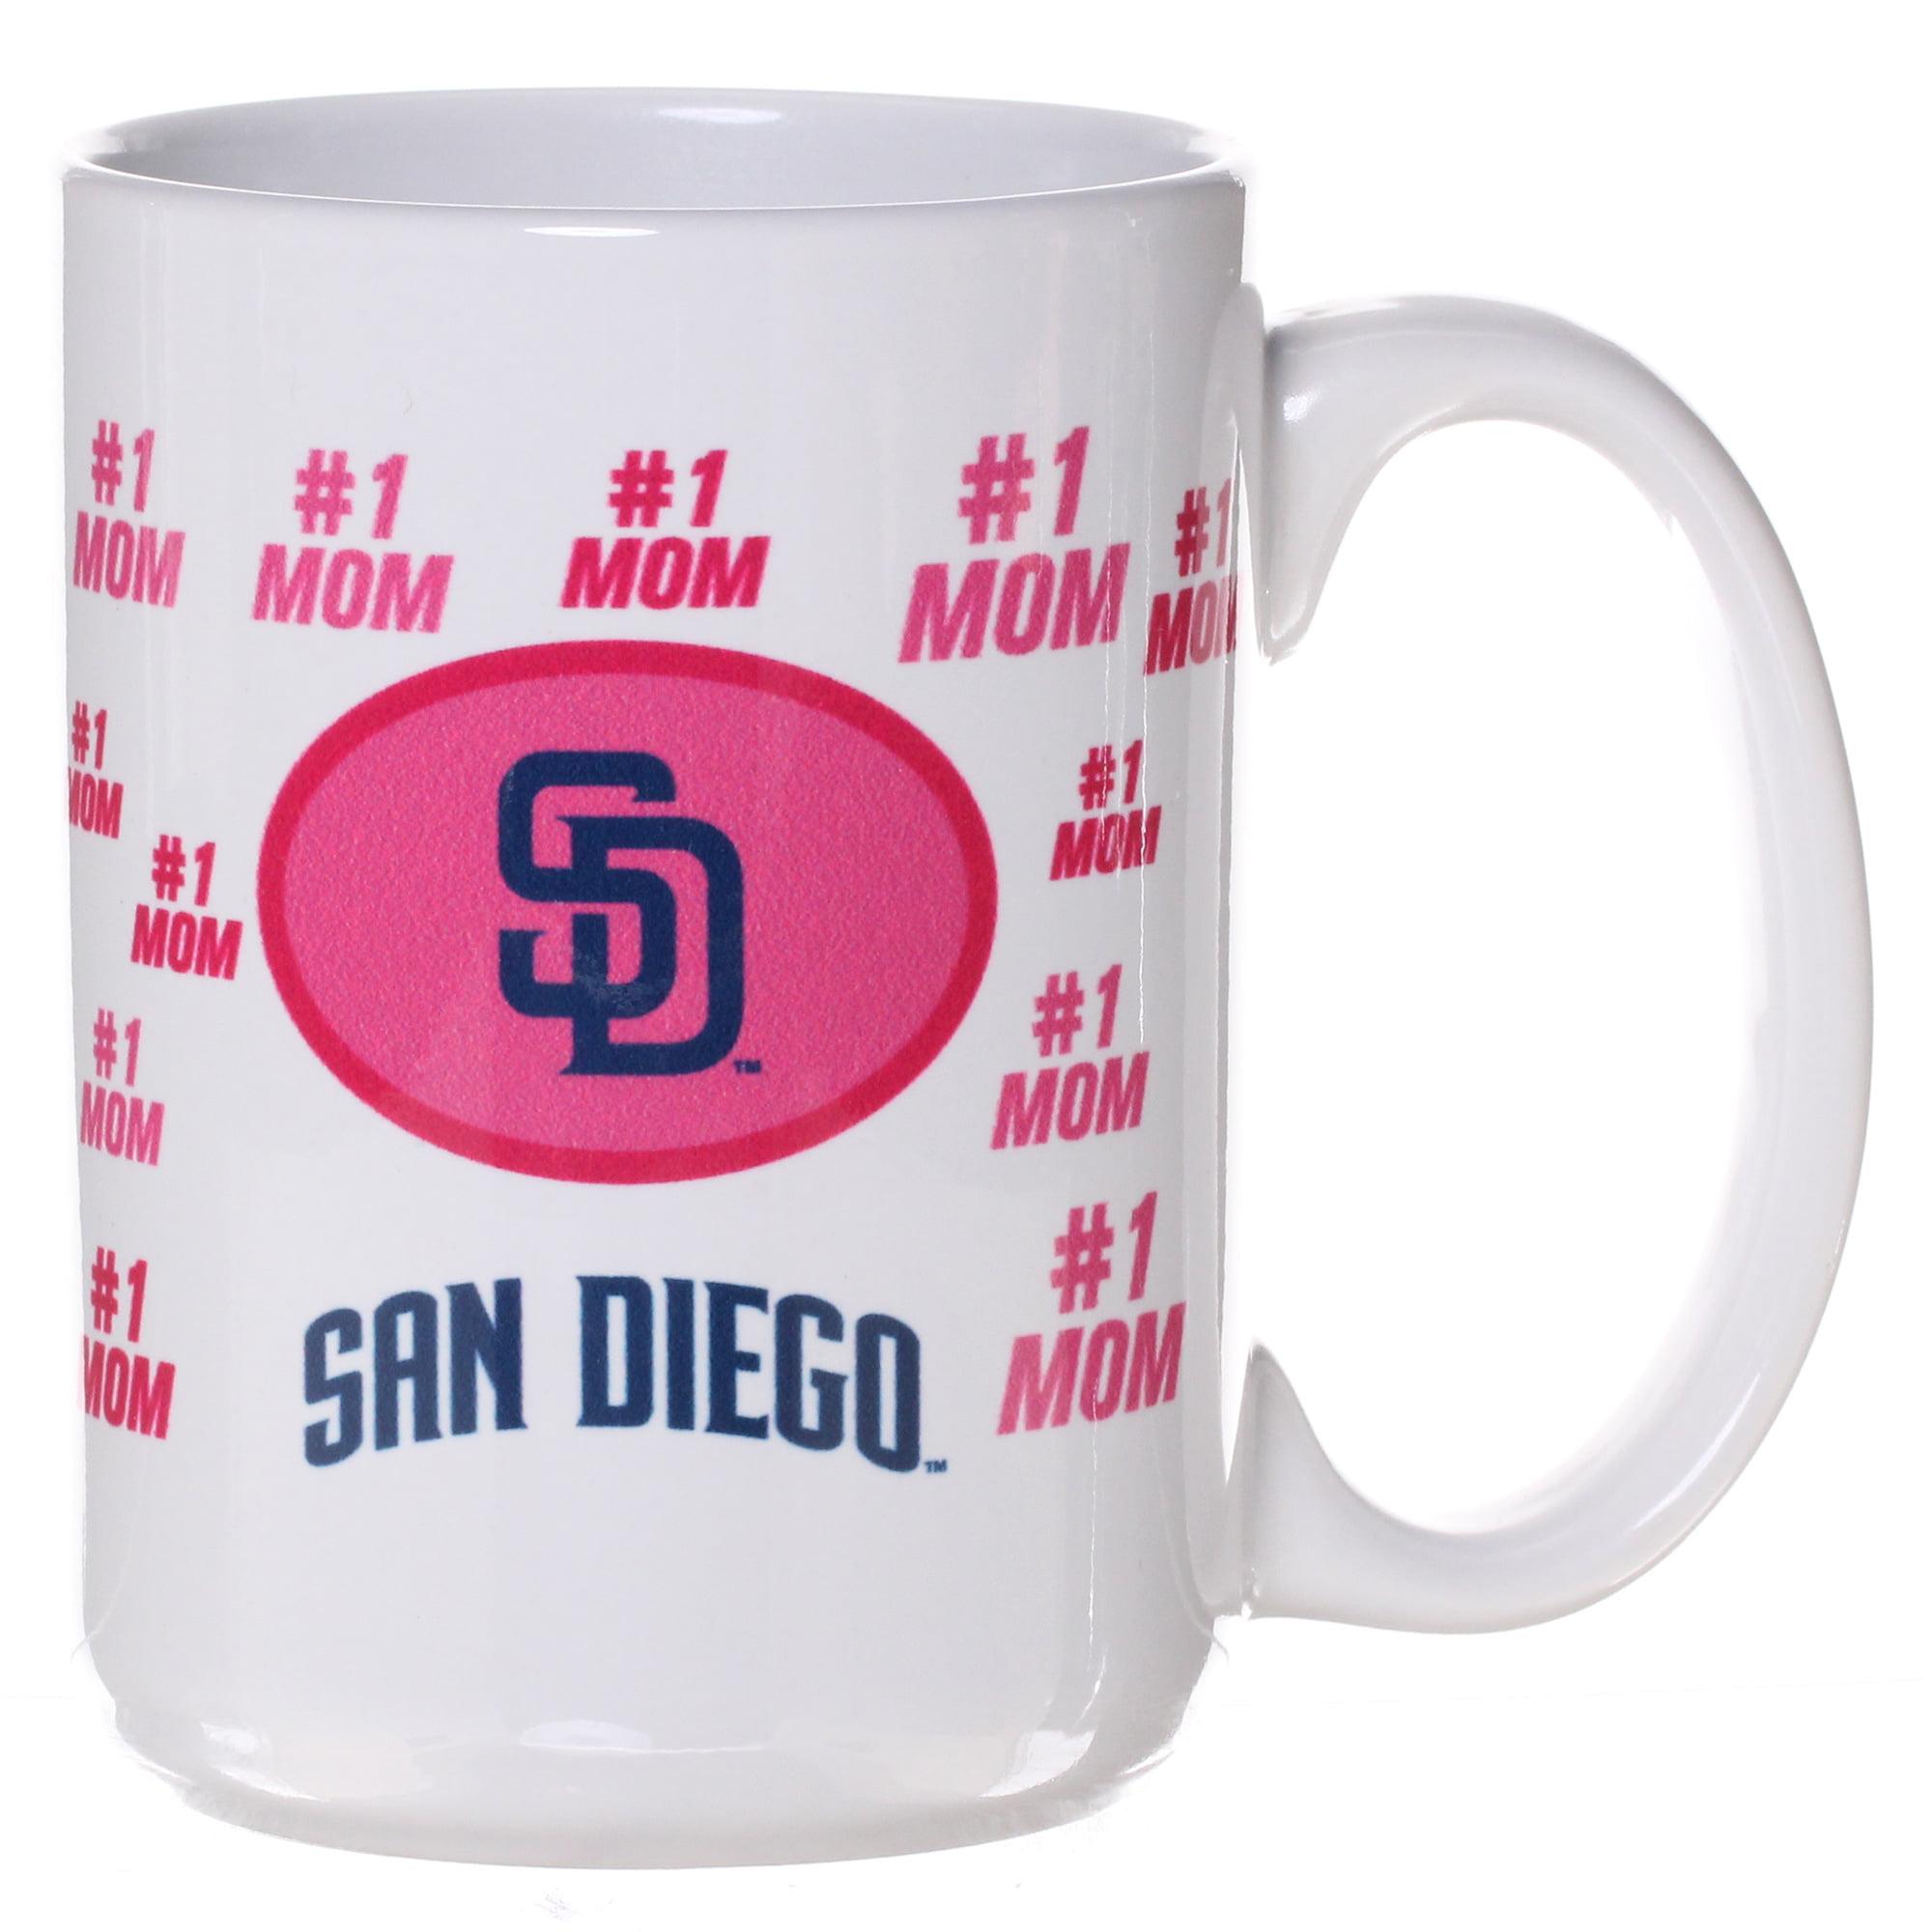 San Diego Padres 15oz. Mother's Day Mug - White - No Size